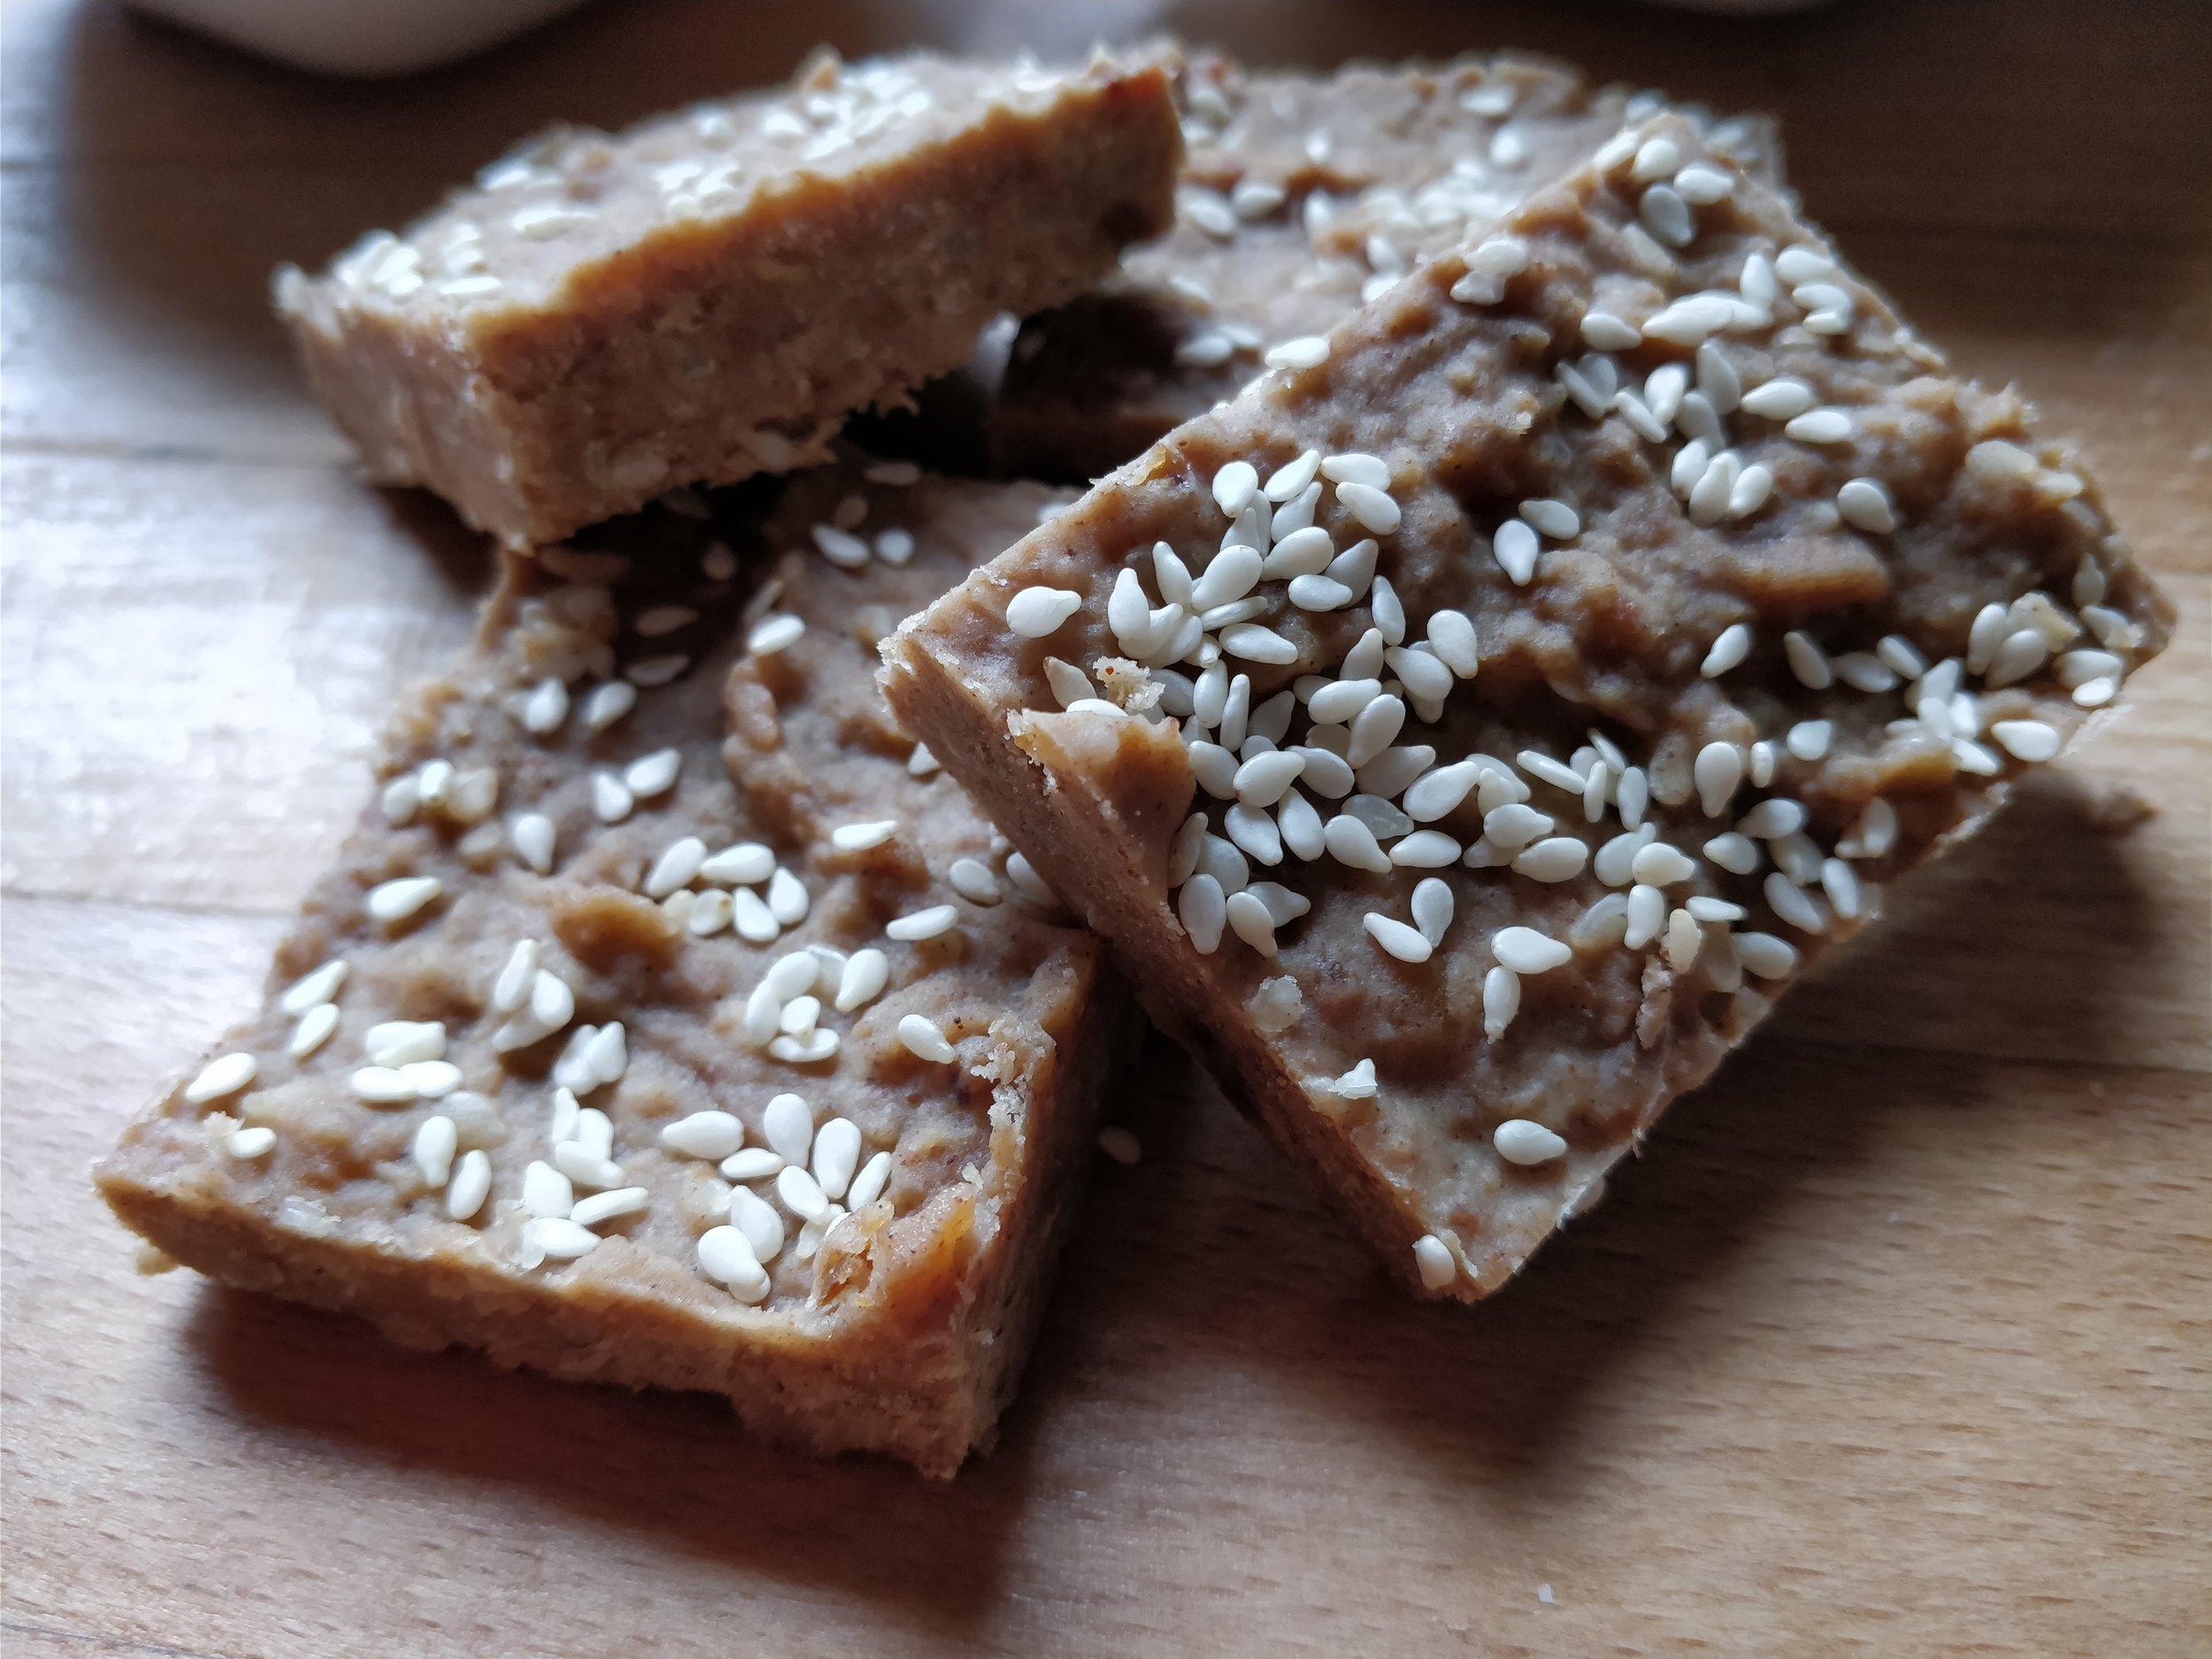 Lentil, date, cashew nut energy bars. Toddler snacks, kid treats, healthy, dairy free, cmpa recipe